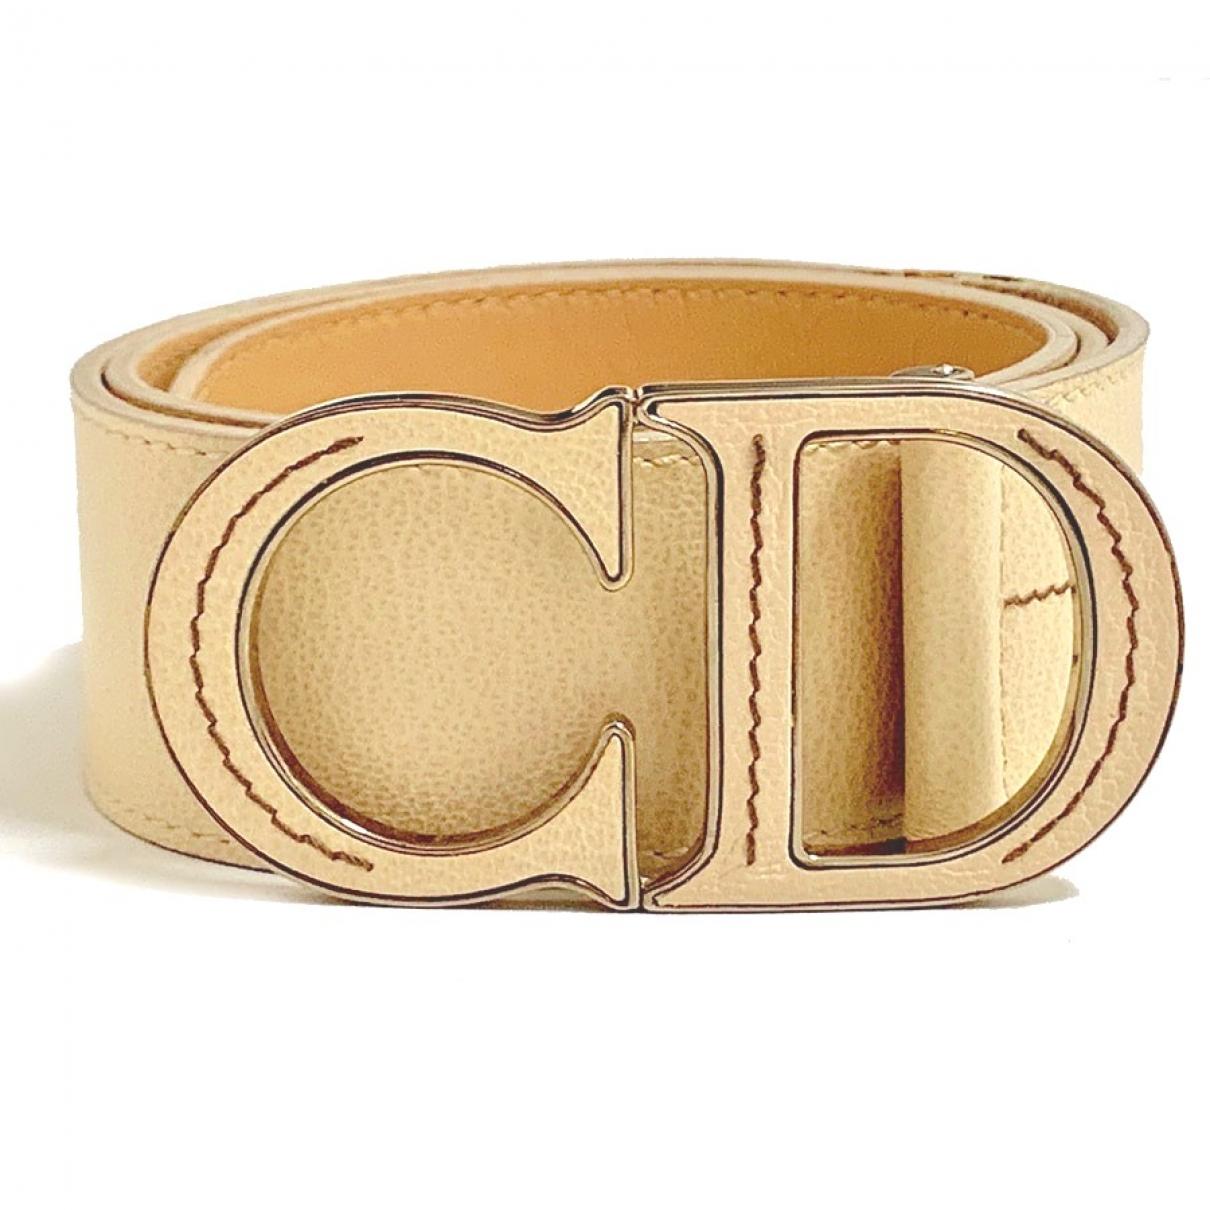 Dior \N Beige Leather belt for Women 75 cm